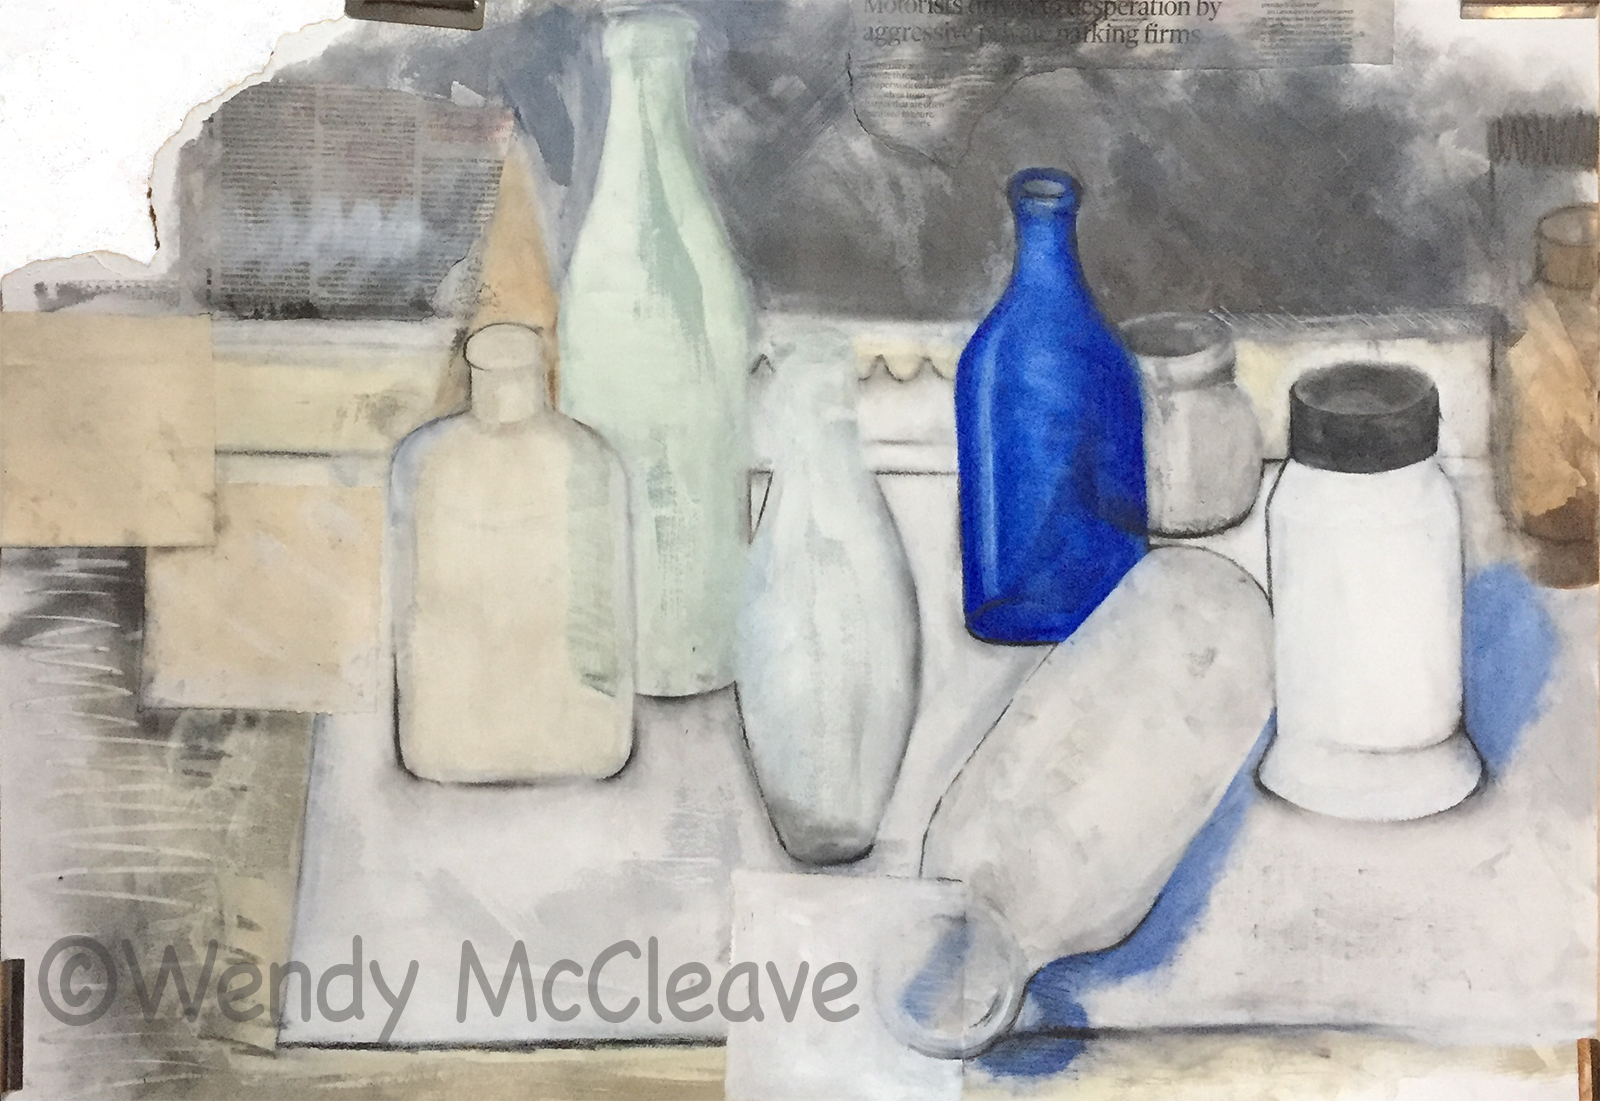 Still life of old bottles with one cobalt blue